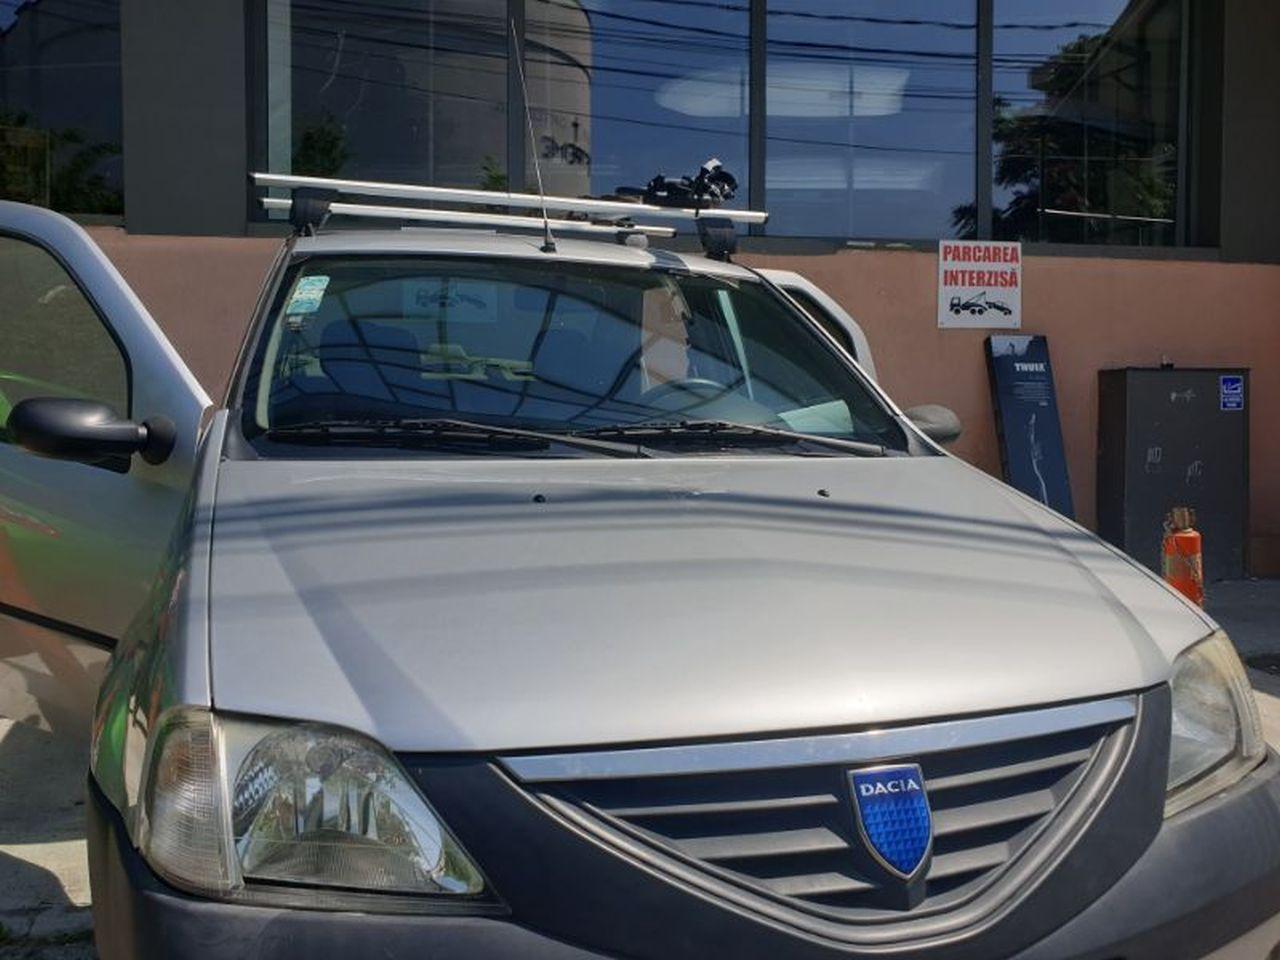 Dacia Logan bare transversale Menabo Delta si suport bicicleta Thule FreeRide